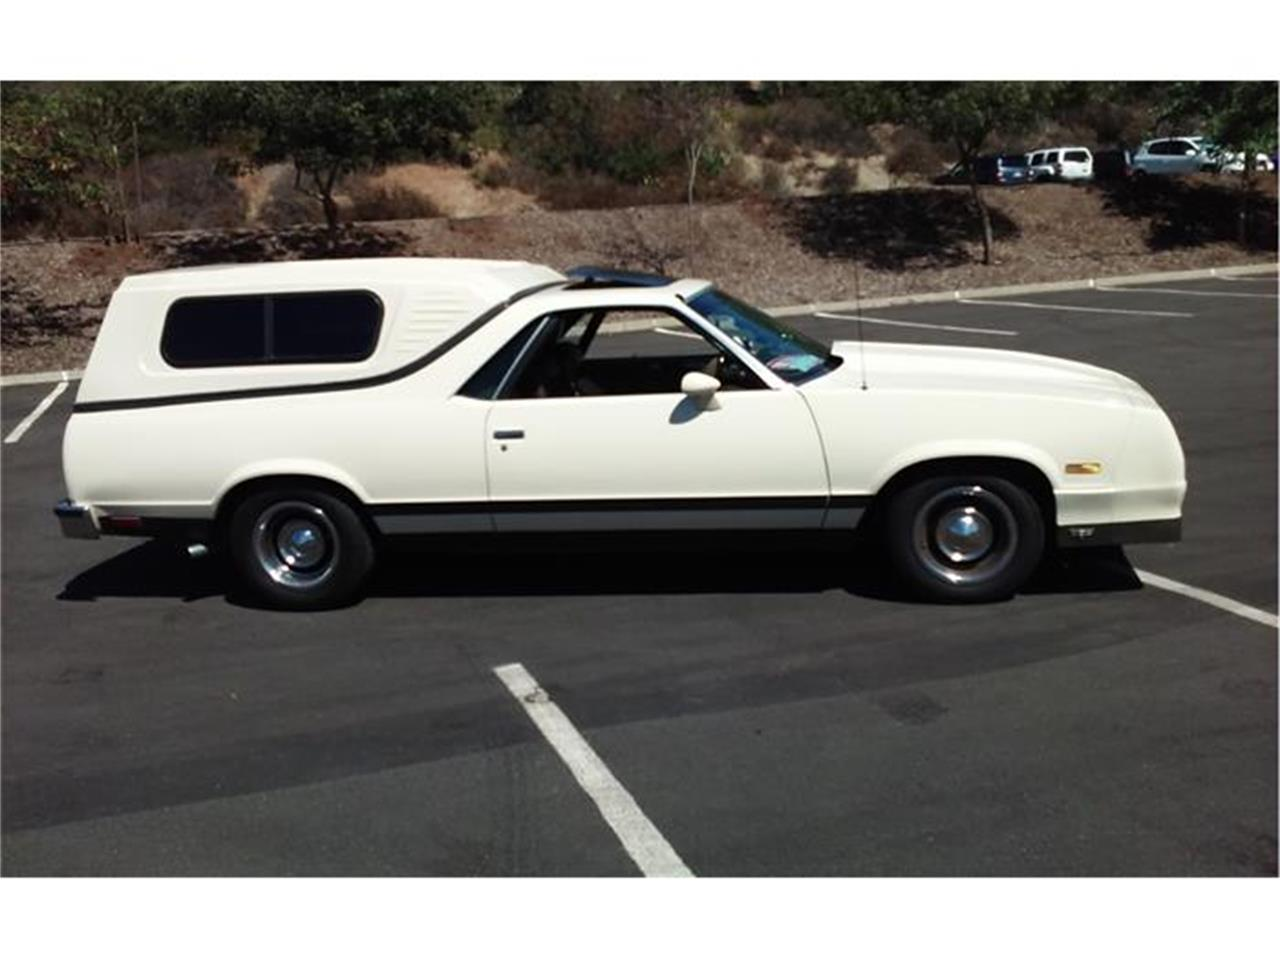 Large Picture of '83 Chevrolet El Camino - $8,700.00 - J05V